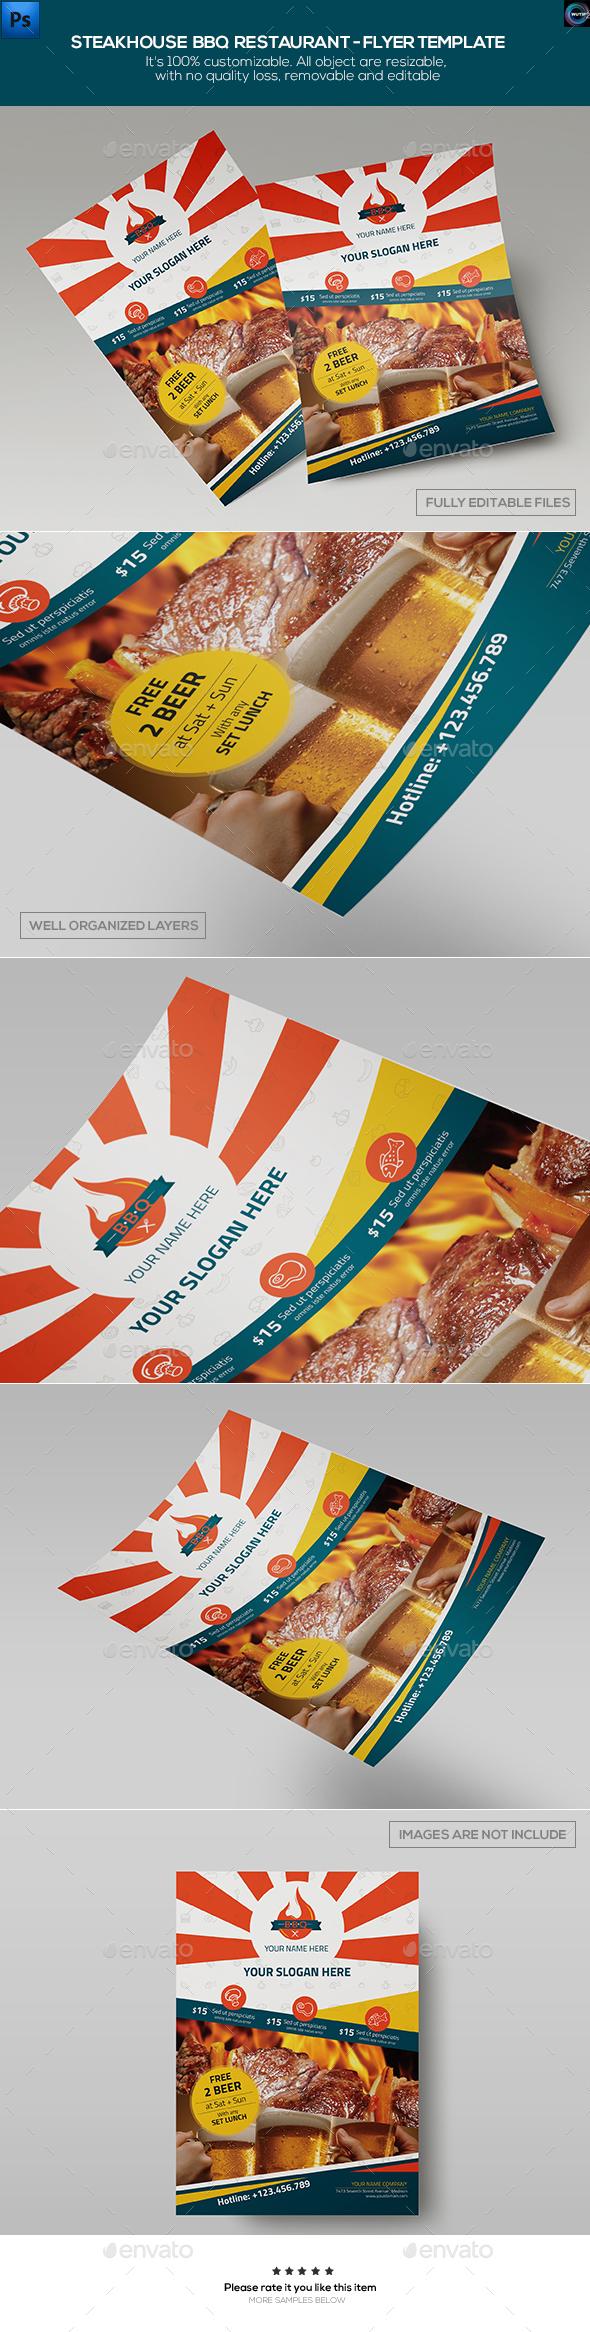 Steakhouse BBQ Restaurant - Flyer Template